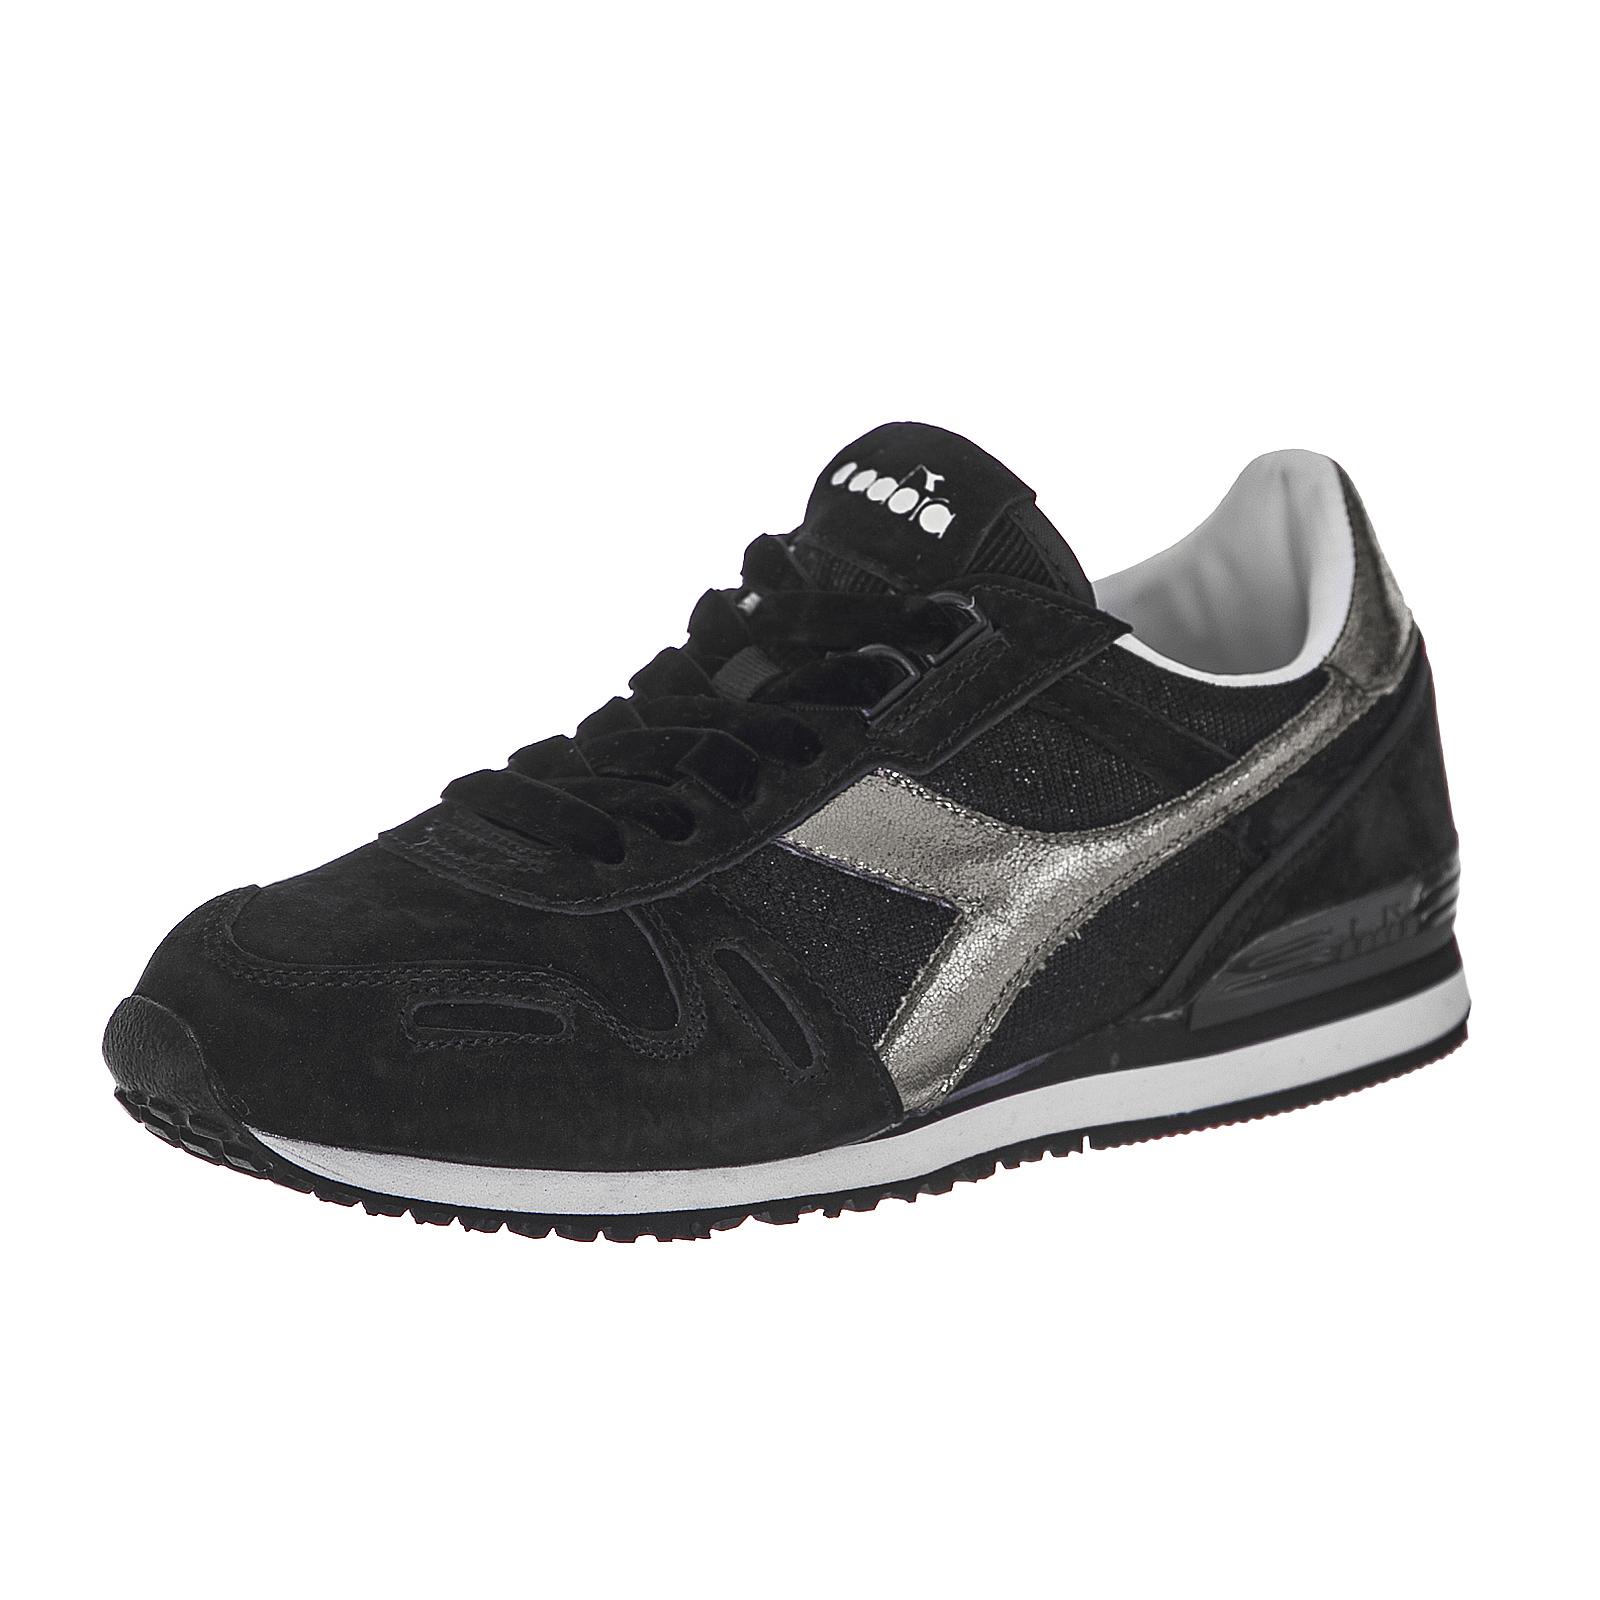 Diadora Sneakers Titan Wn Premium Black Black